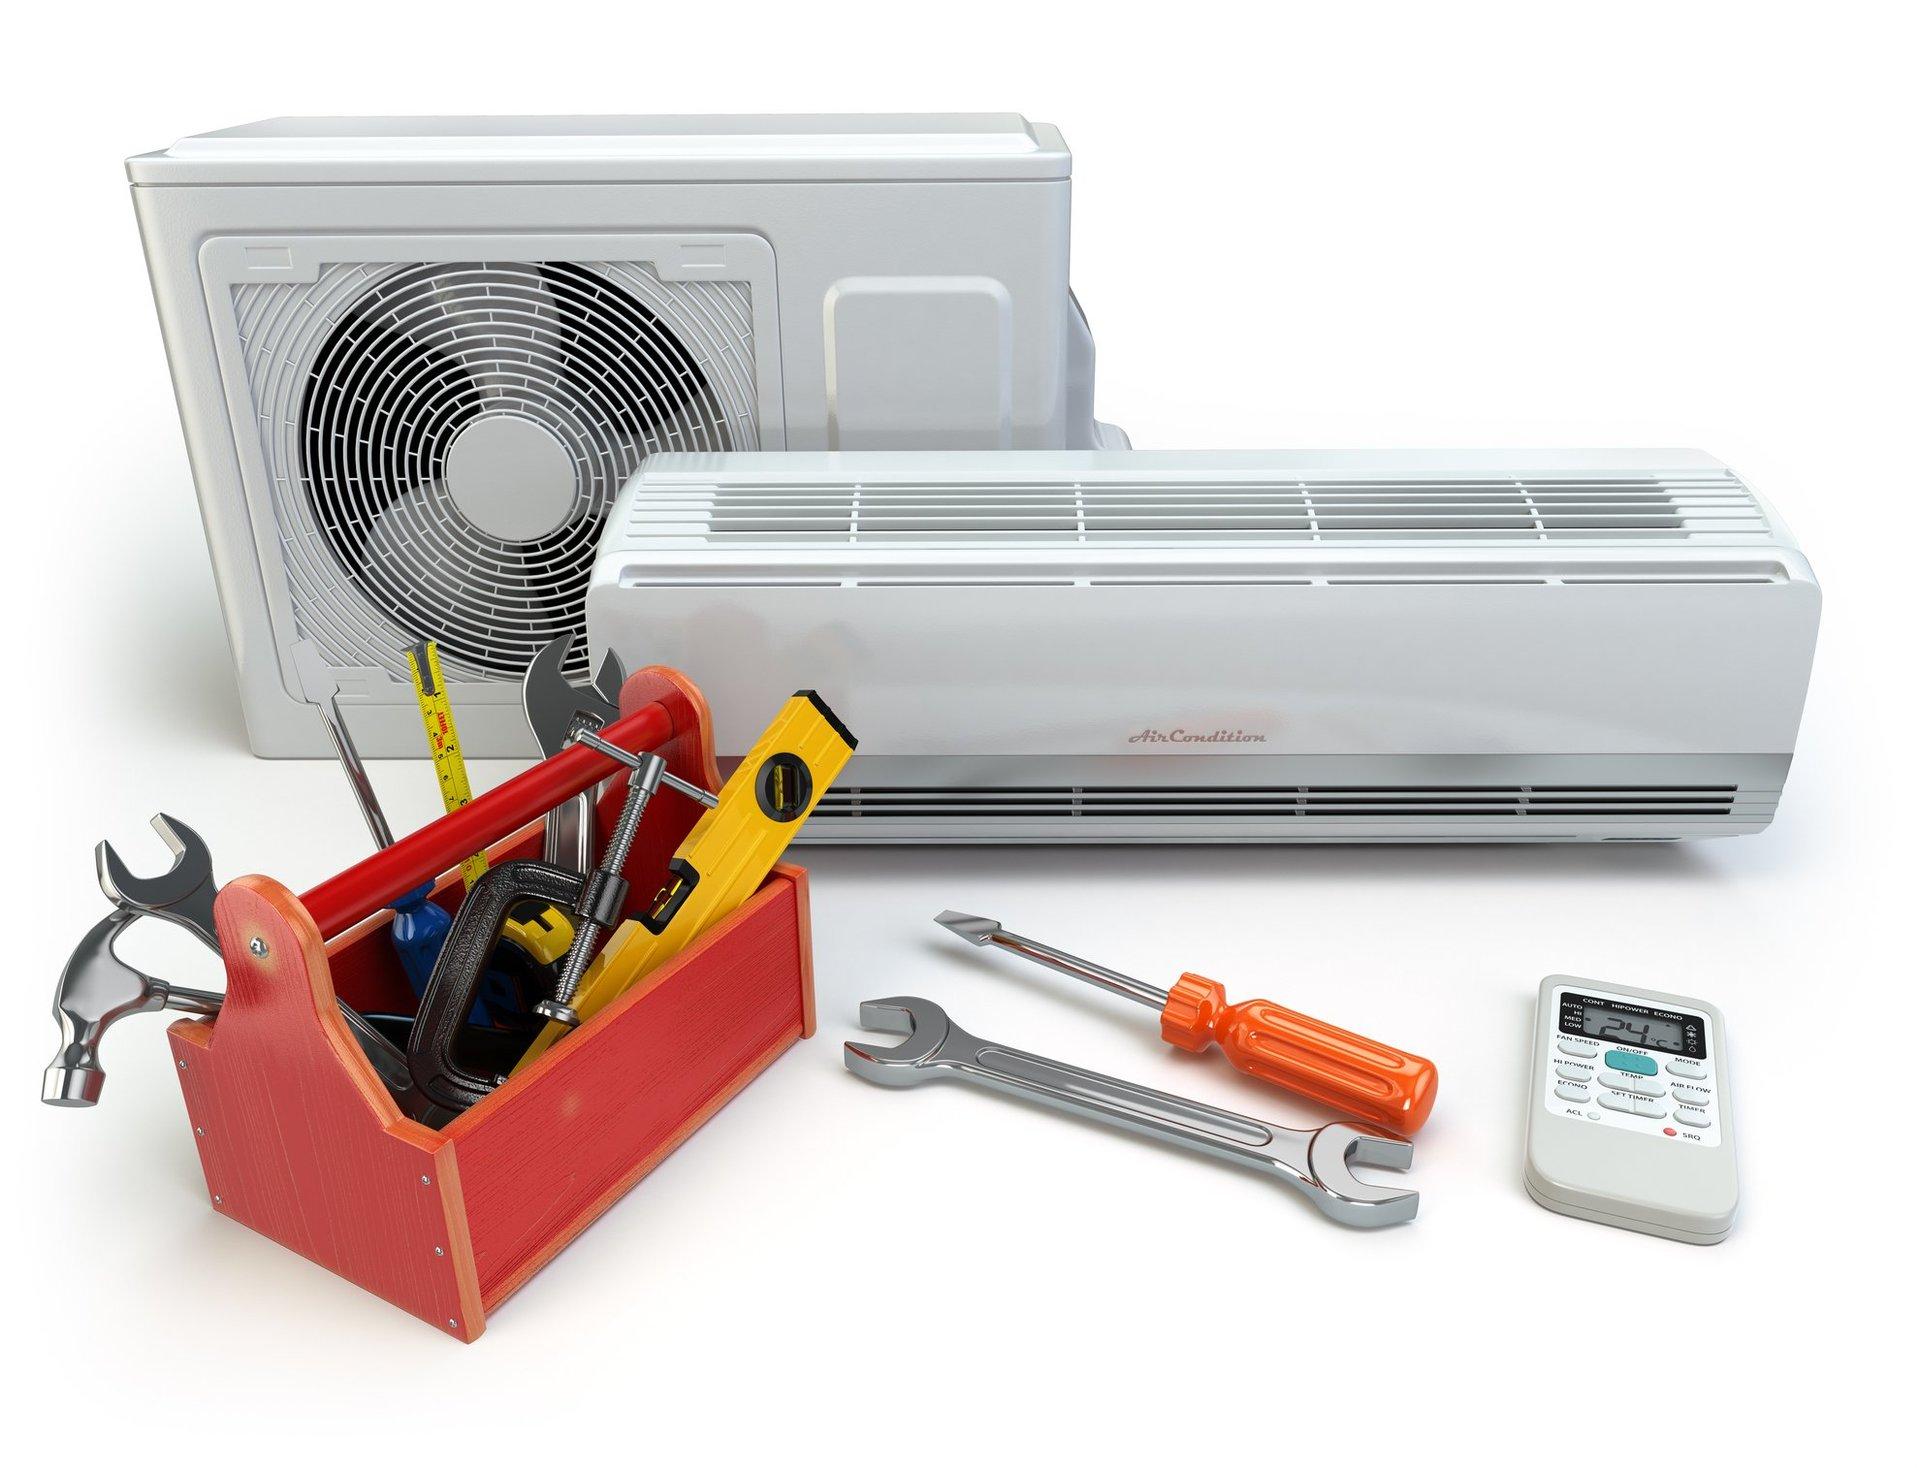 AirCon Service Company HVAC Service Plan